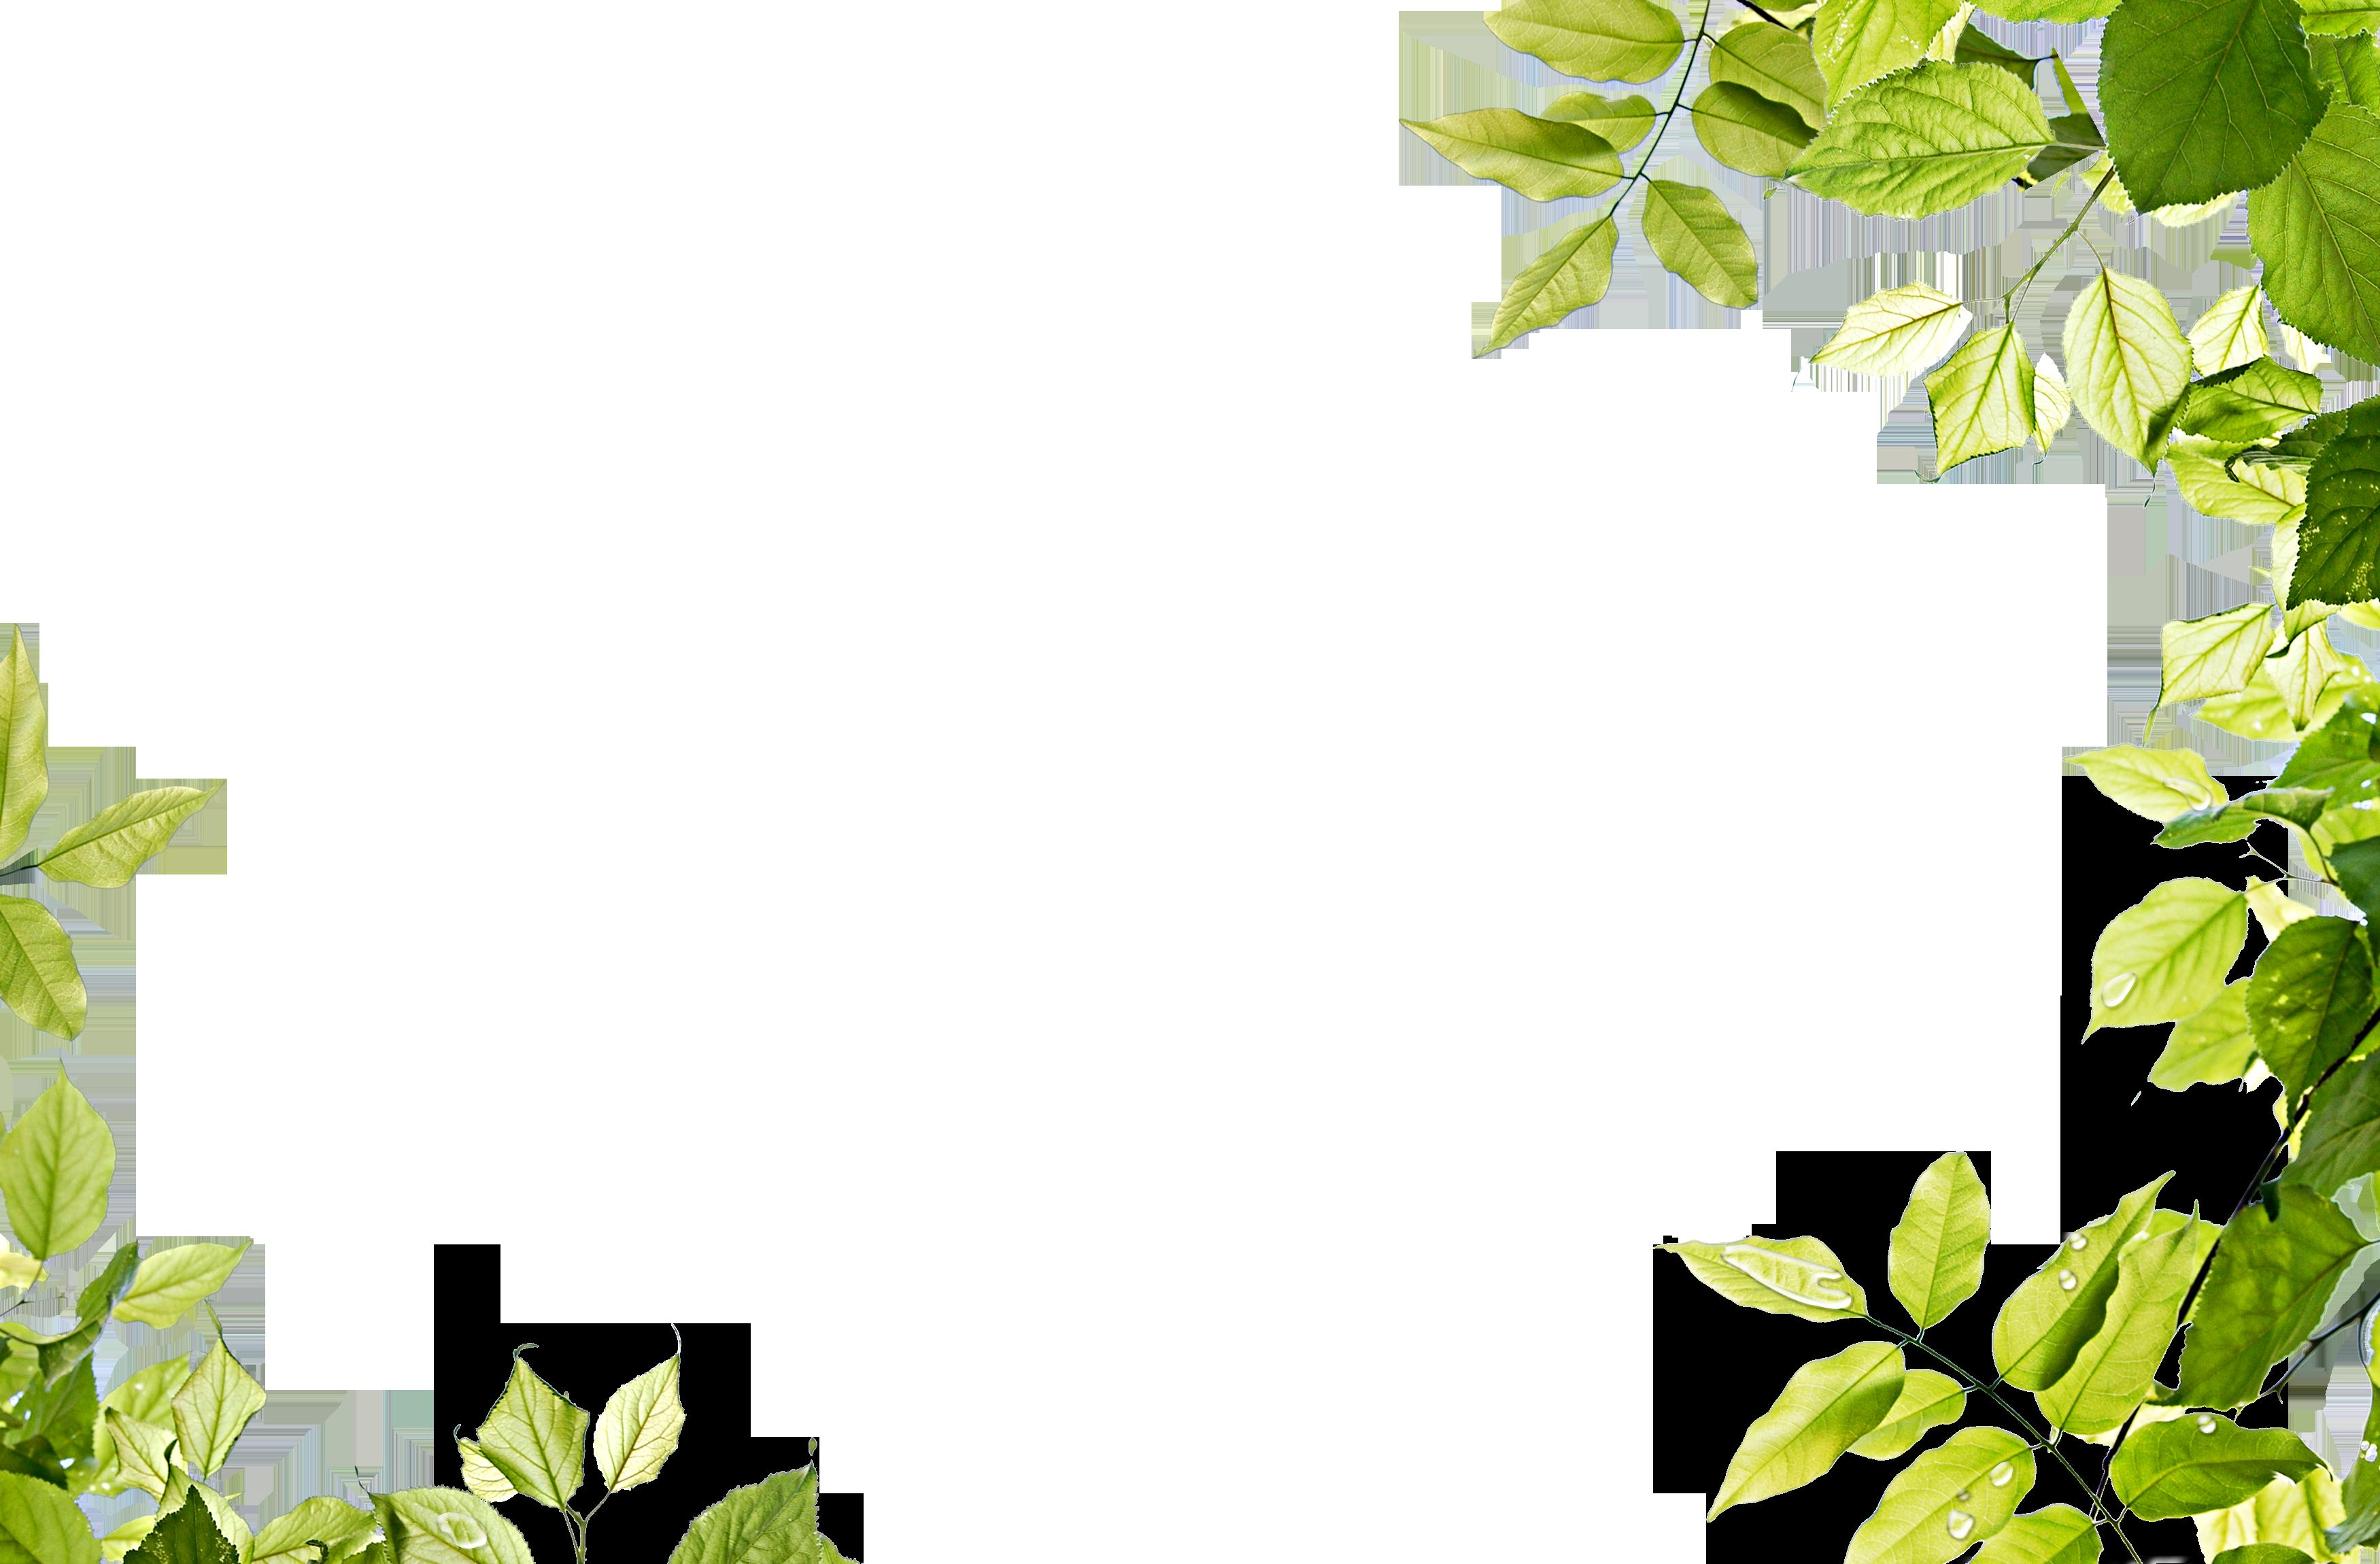 green leaves frame png image